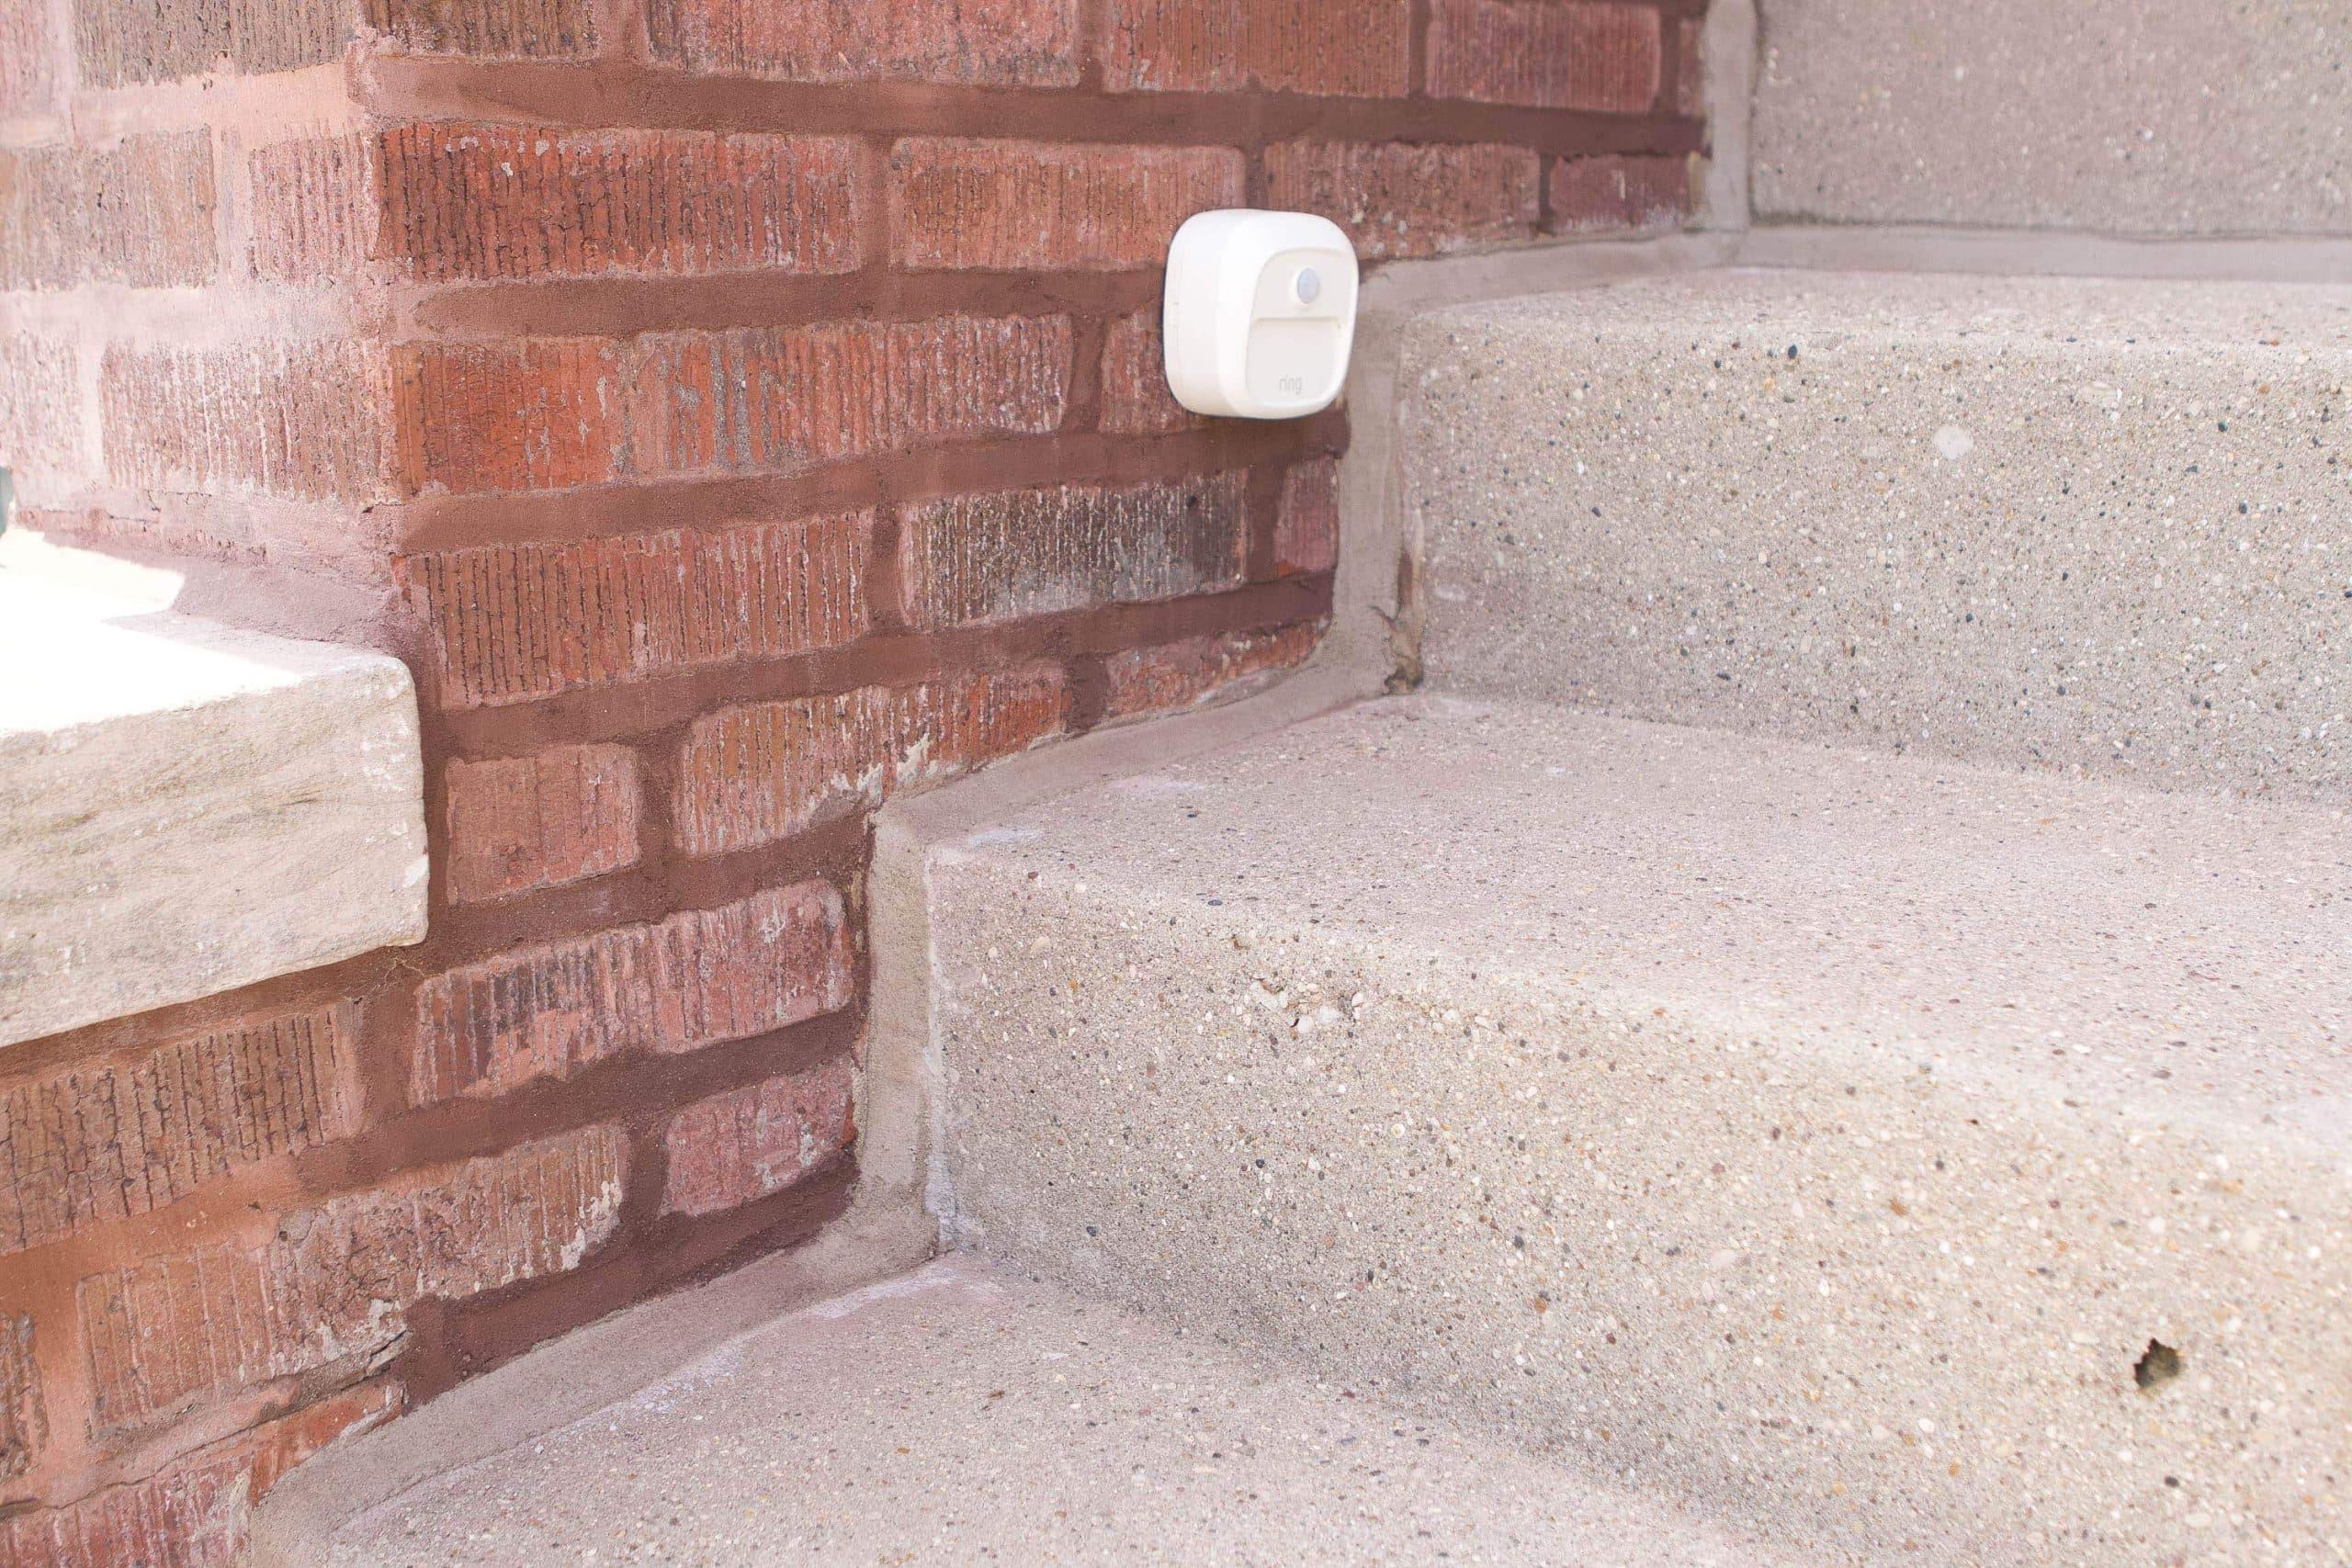 Fixing crumbling mortar lines